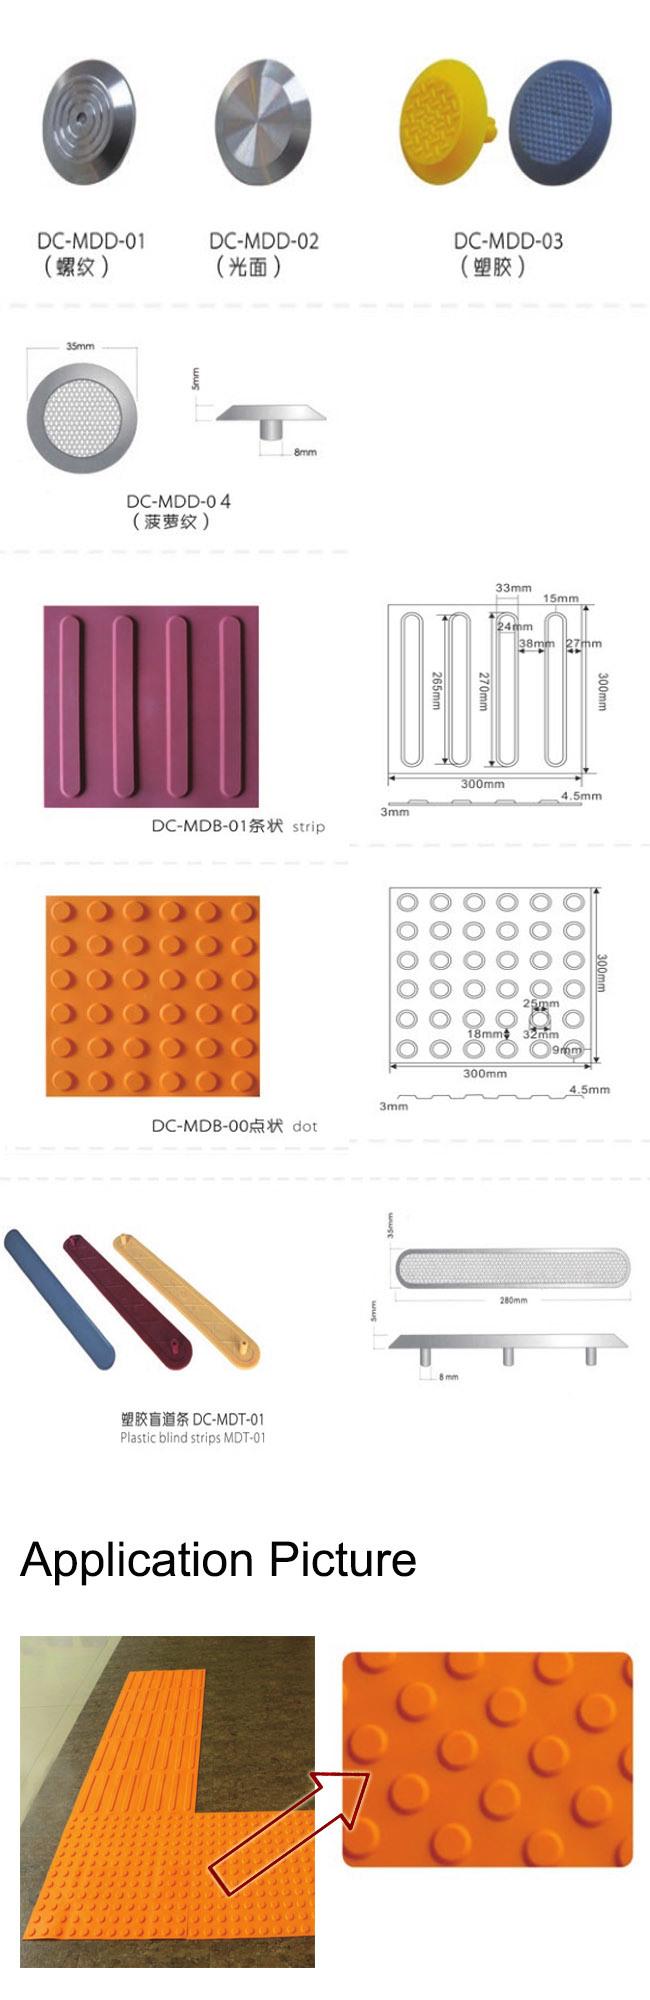 Hot Sale Road Tactile PVC Floor Rubber Tiles for Blind